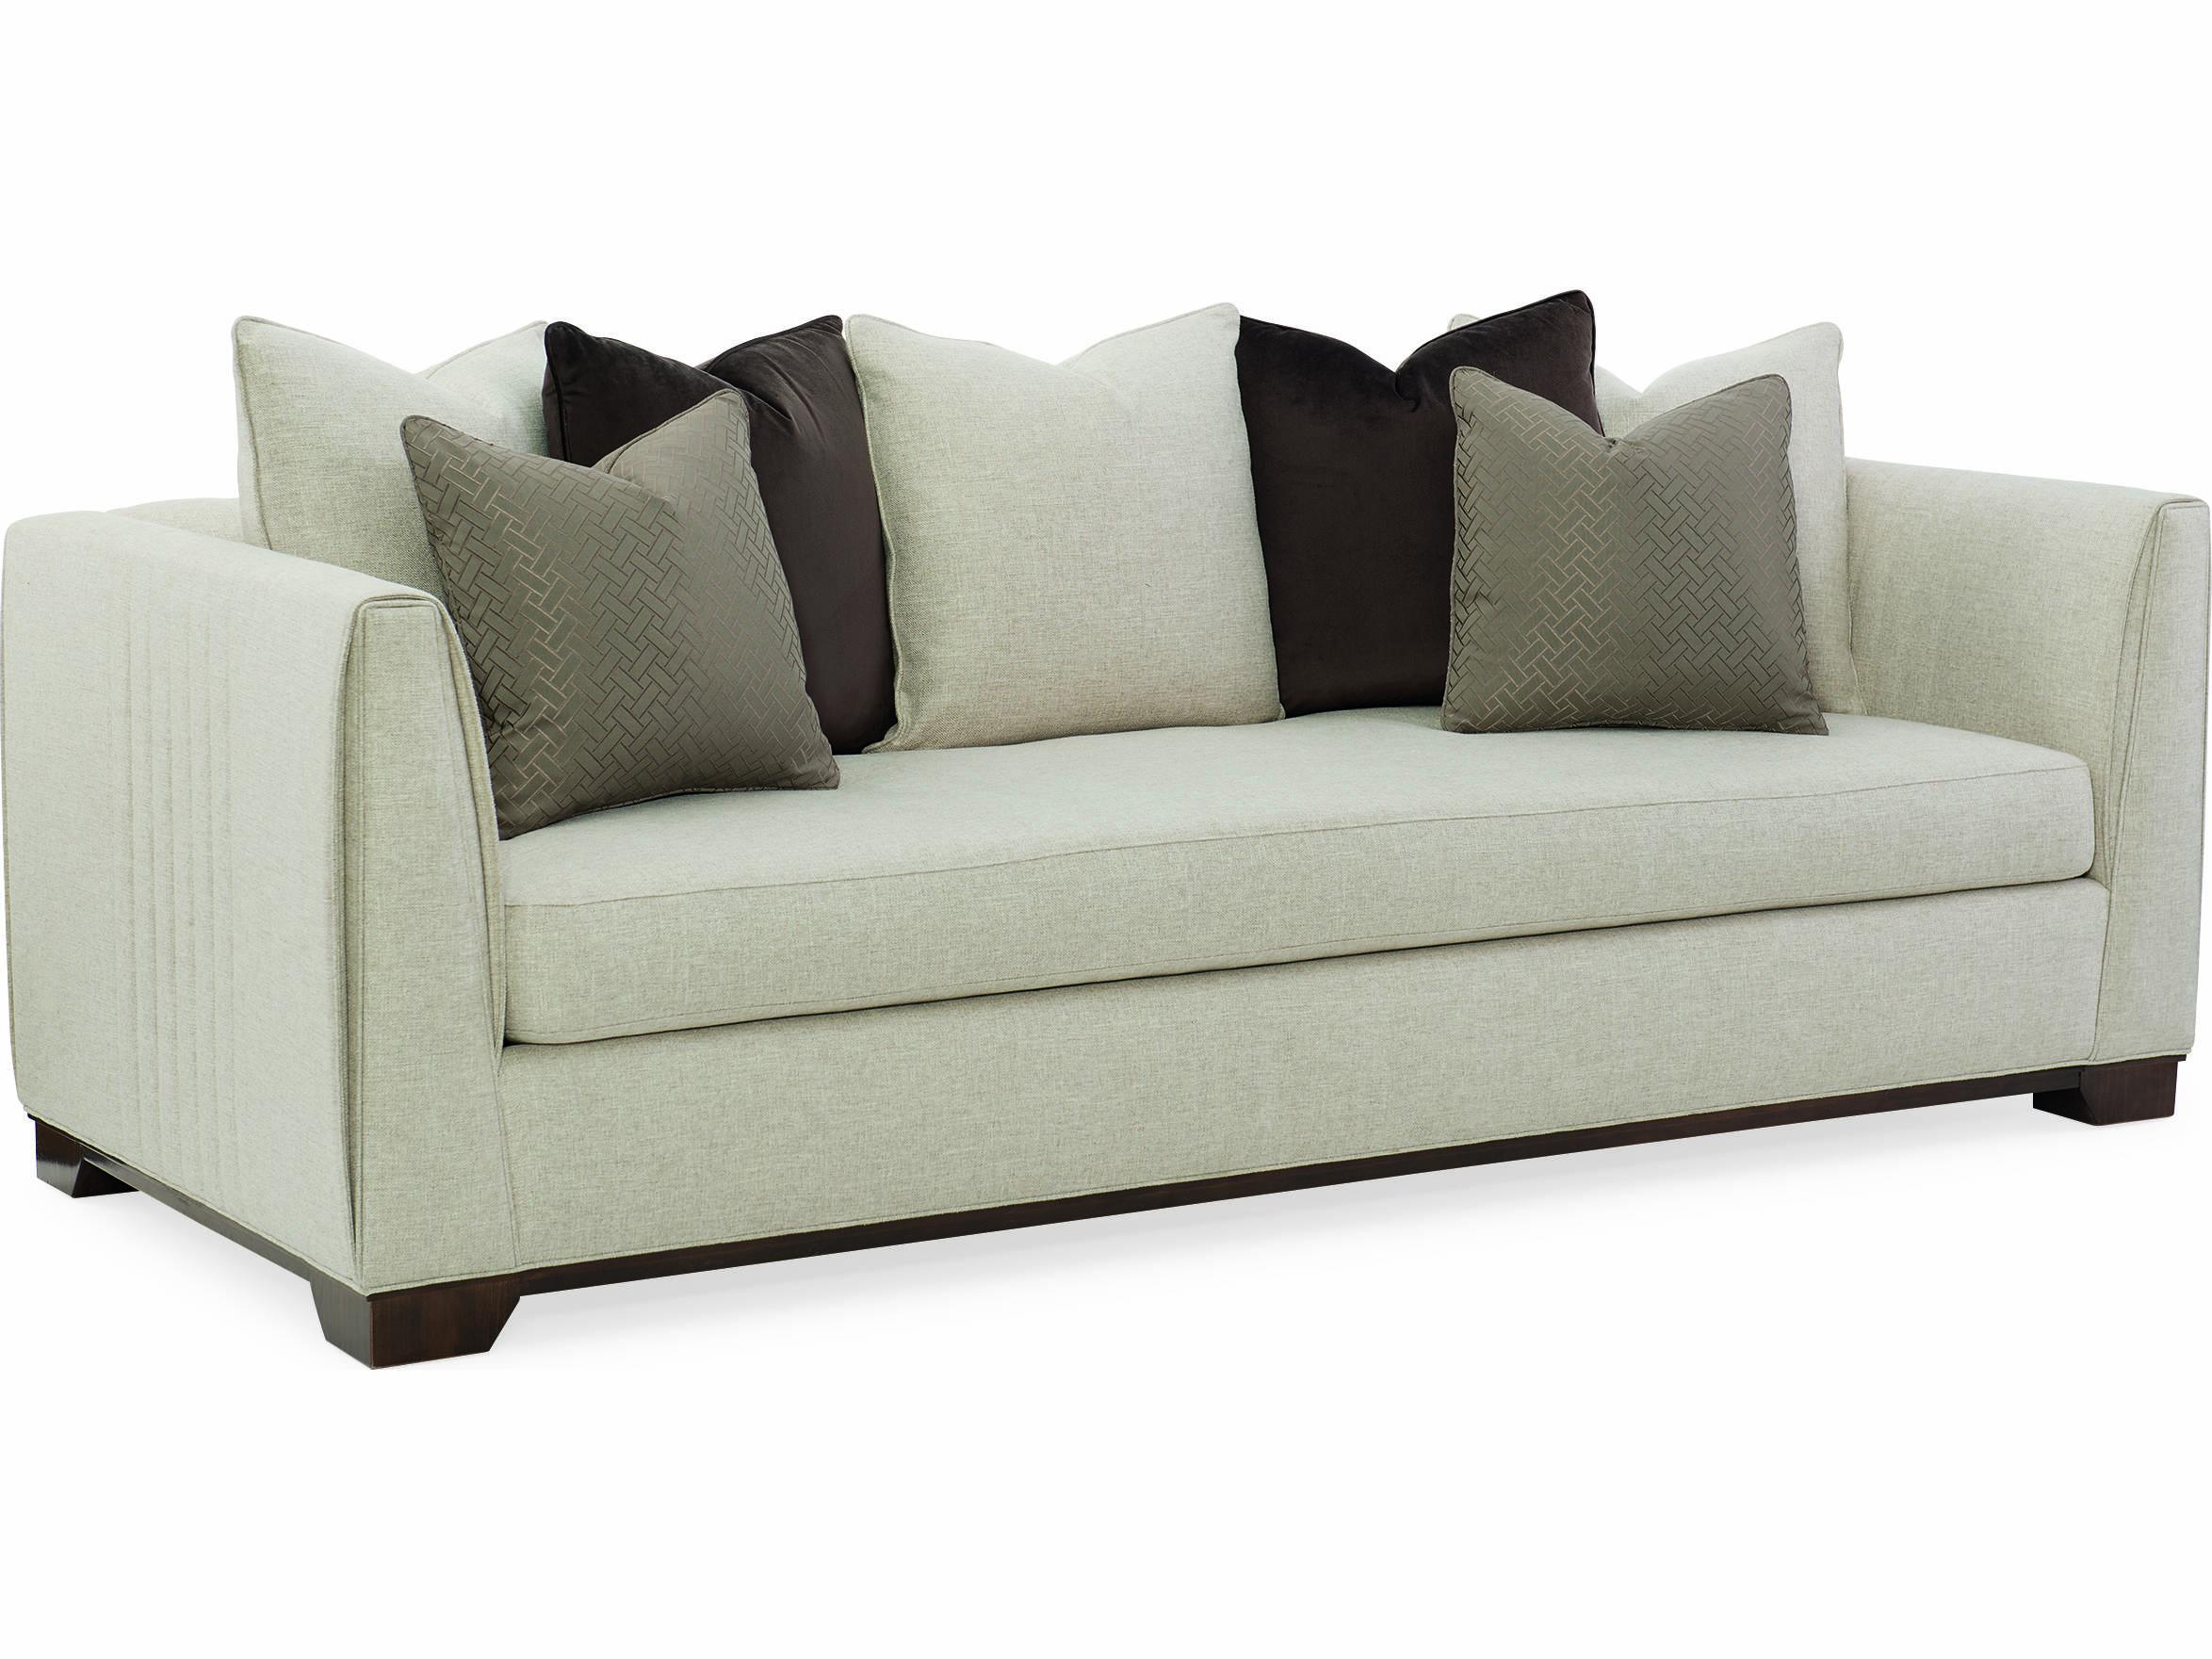 Incredible Caracole Modern Streamline Beige Sofa Bralicious Painted Fabric Chair Ideas Braliciousco